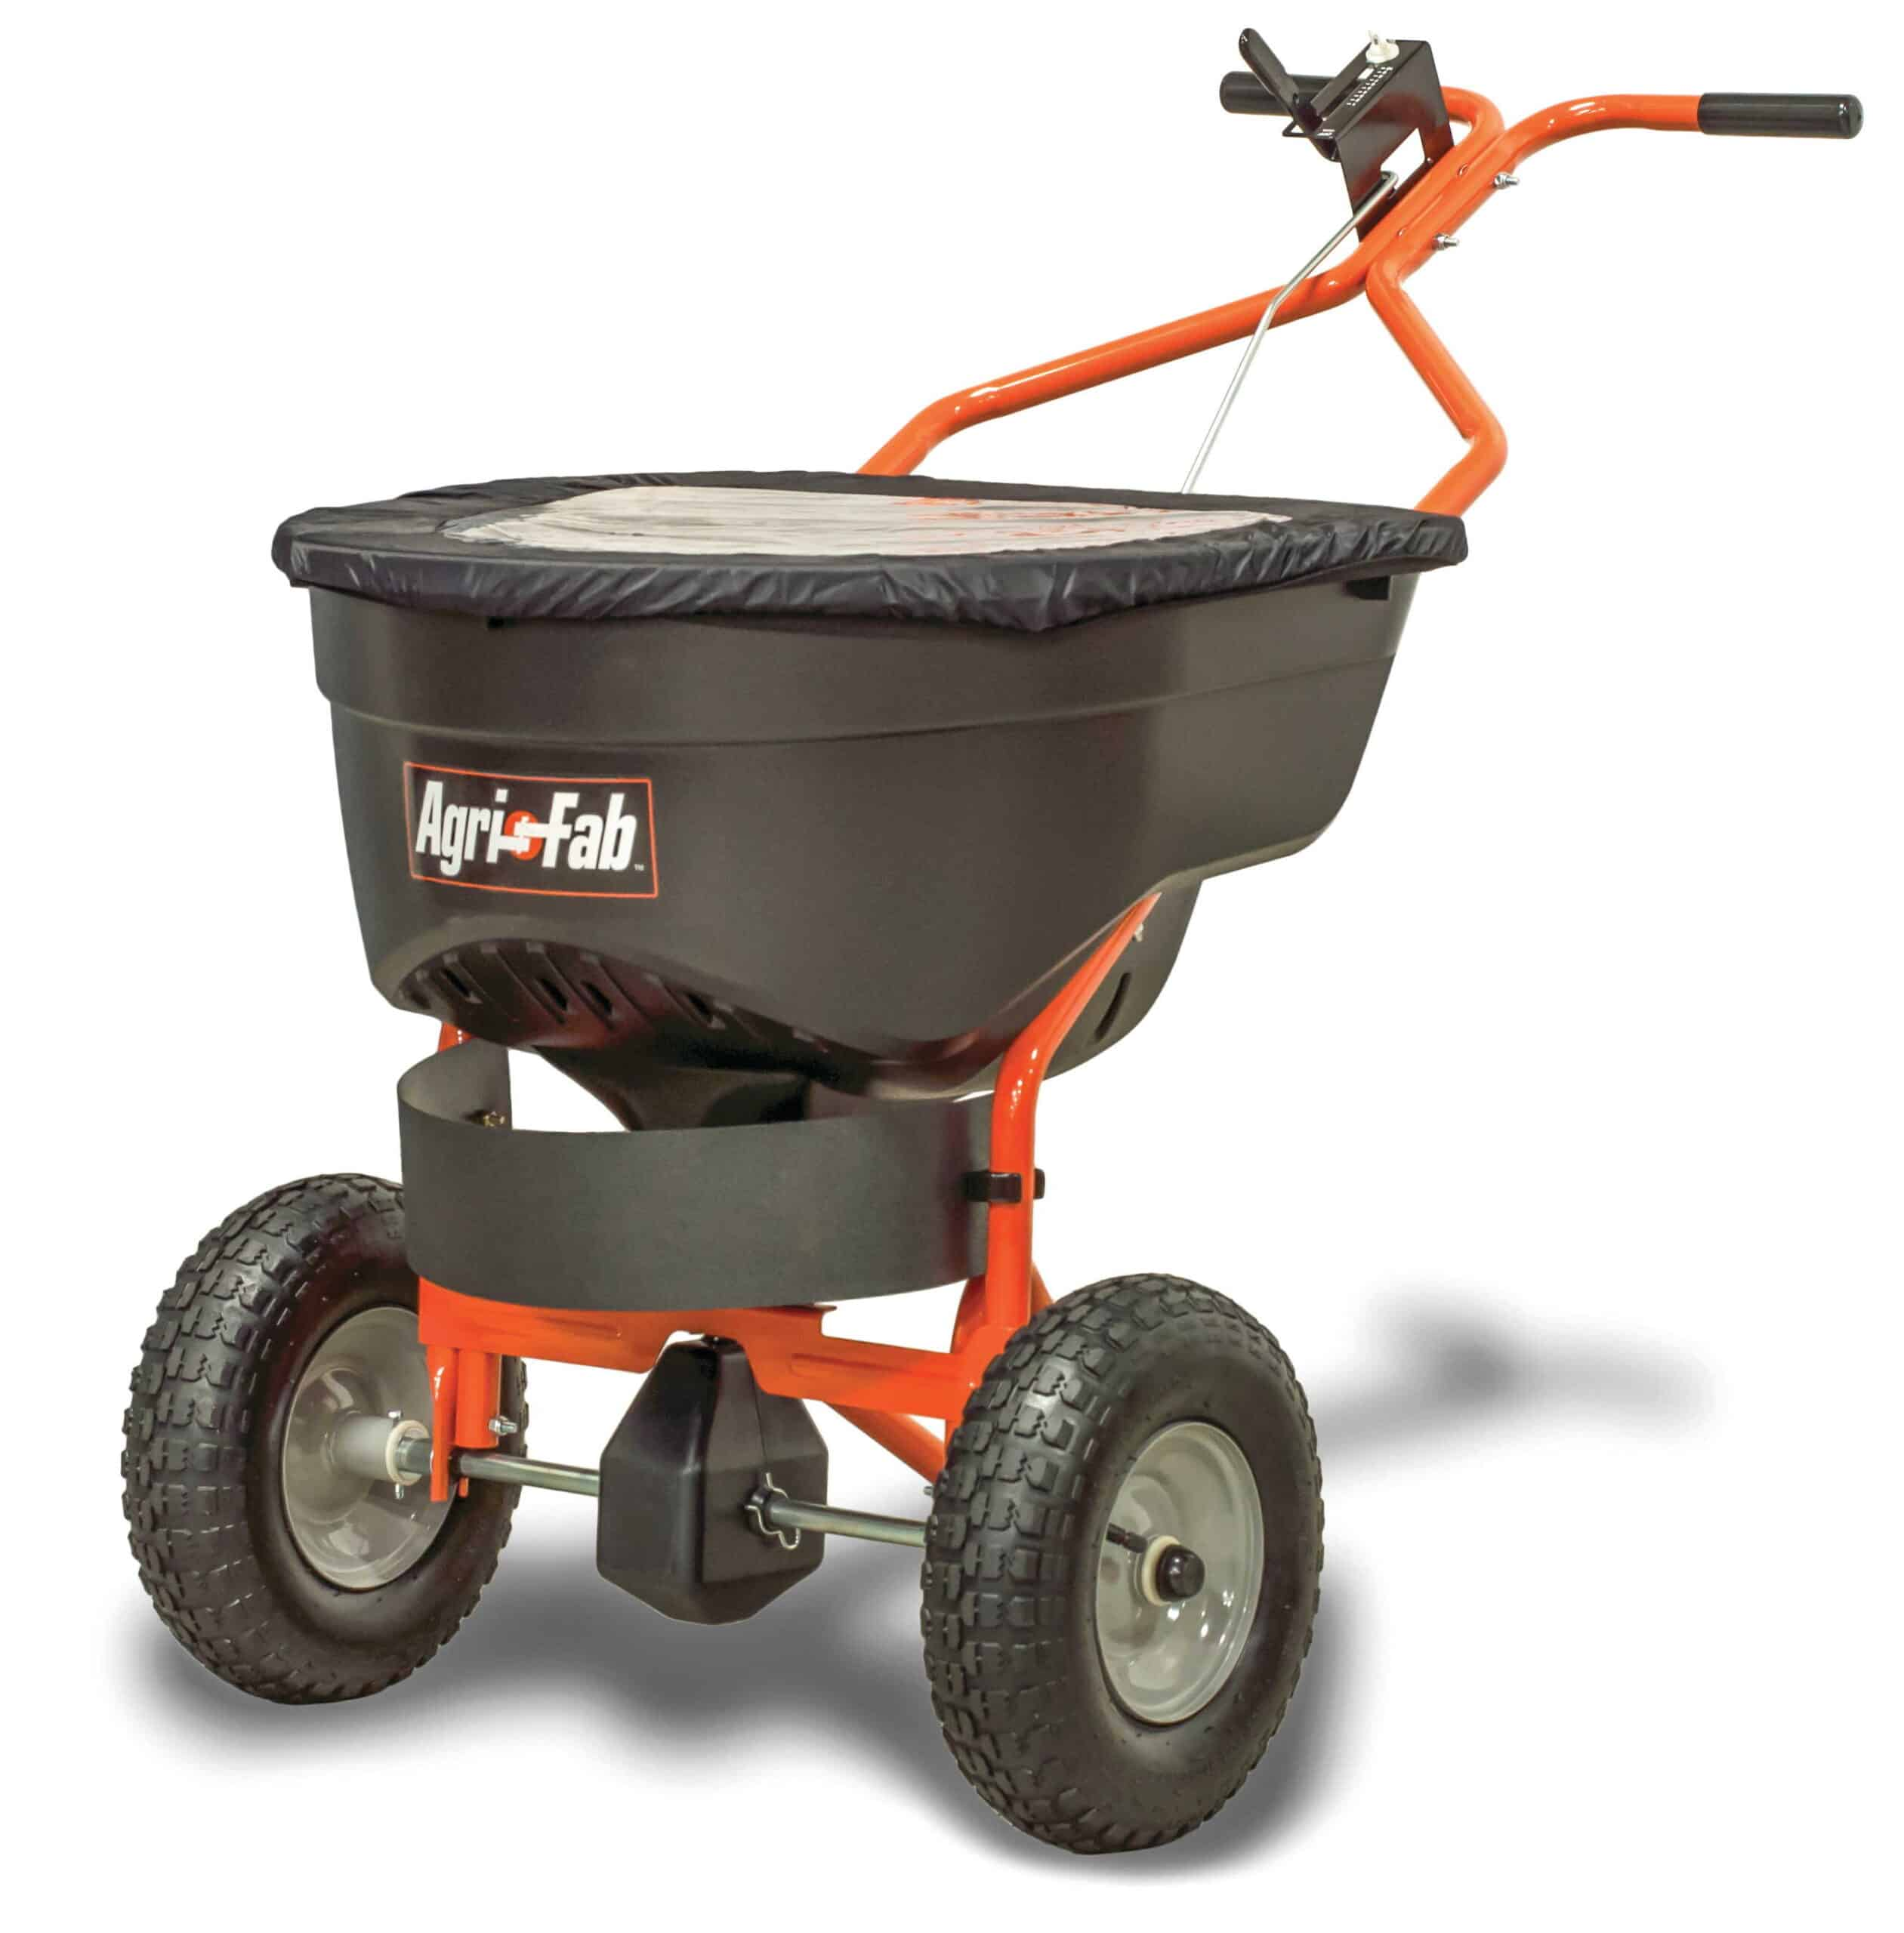 Agri-Fab Inc 130-Pound Push Broadcast Spreader - best fertiliser spreader for small lawn - best fertiliser spreader for small lawn